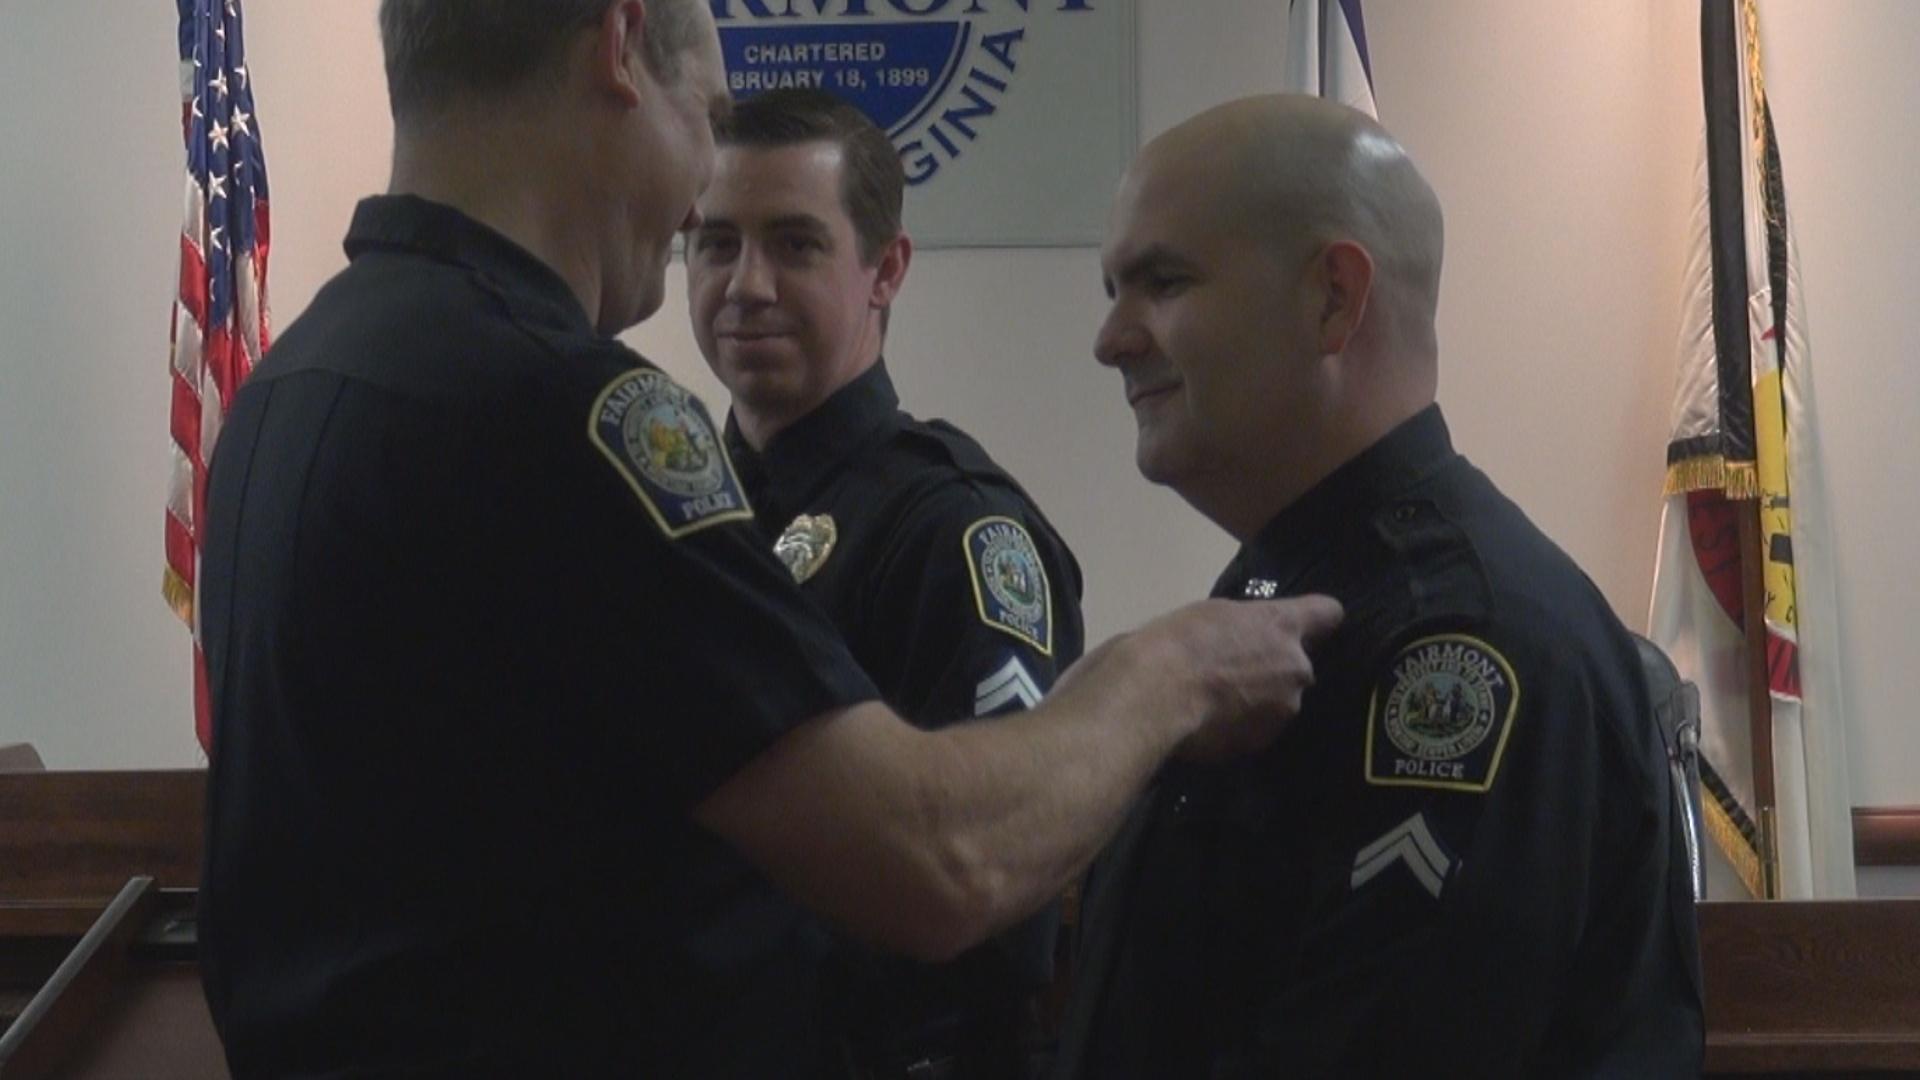 Officer promotion ceremony